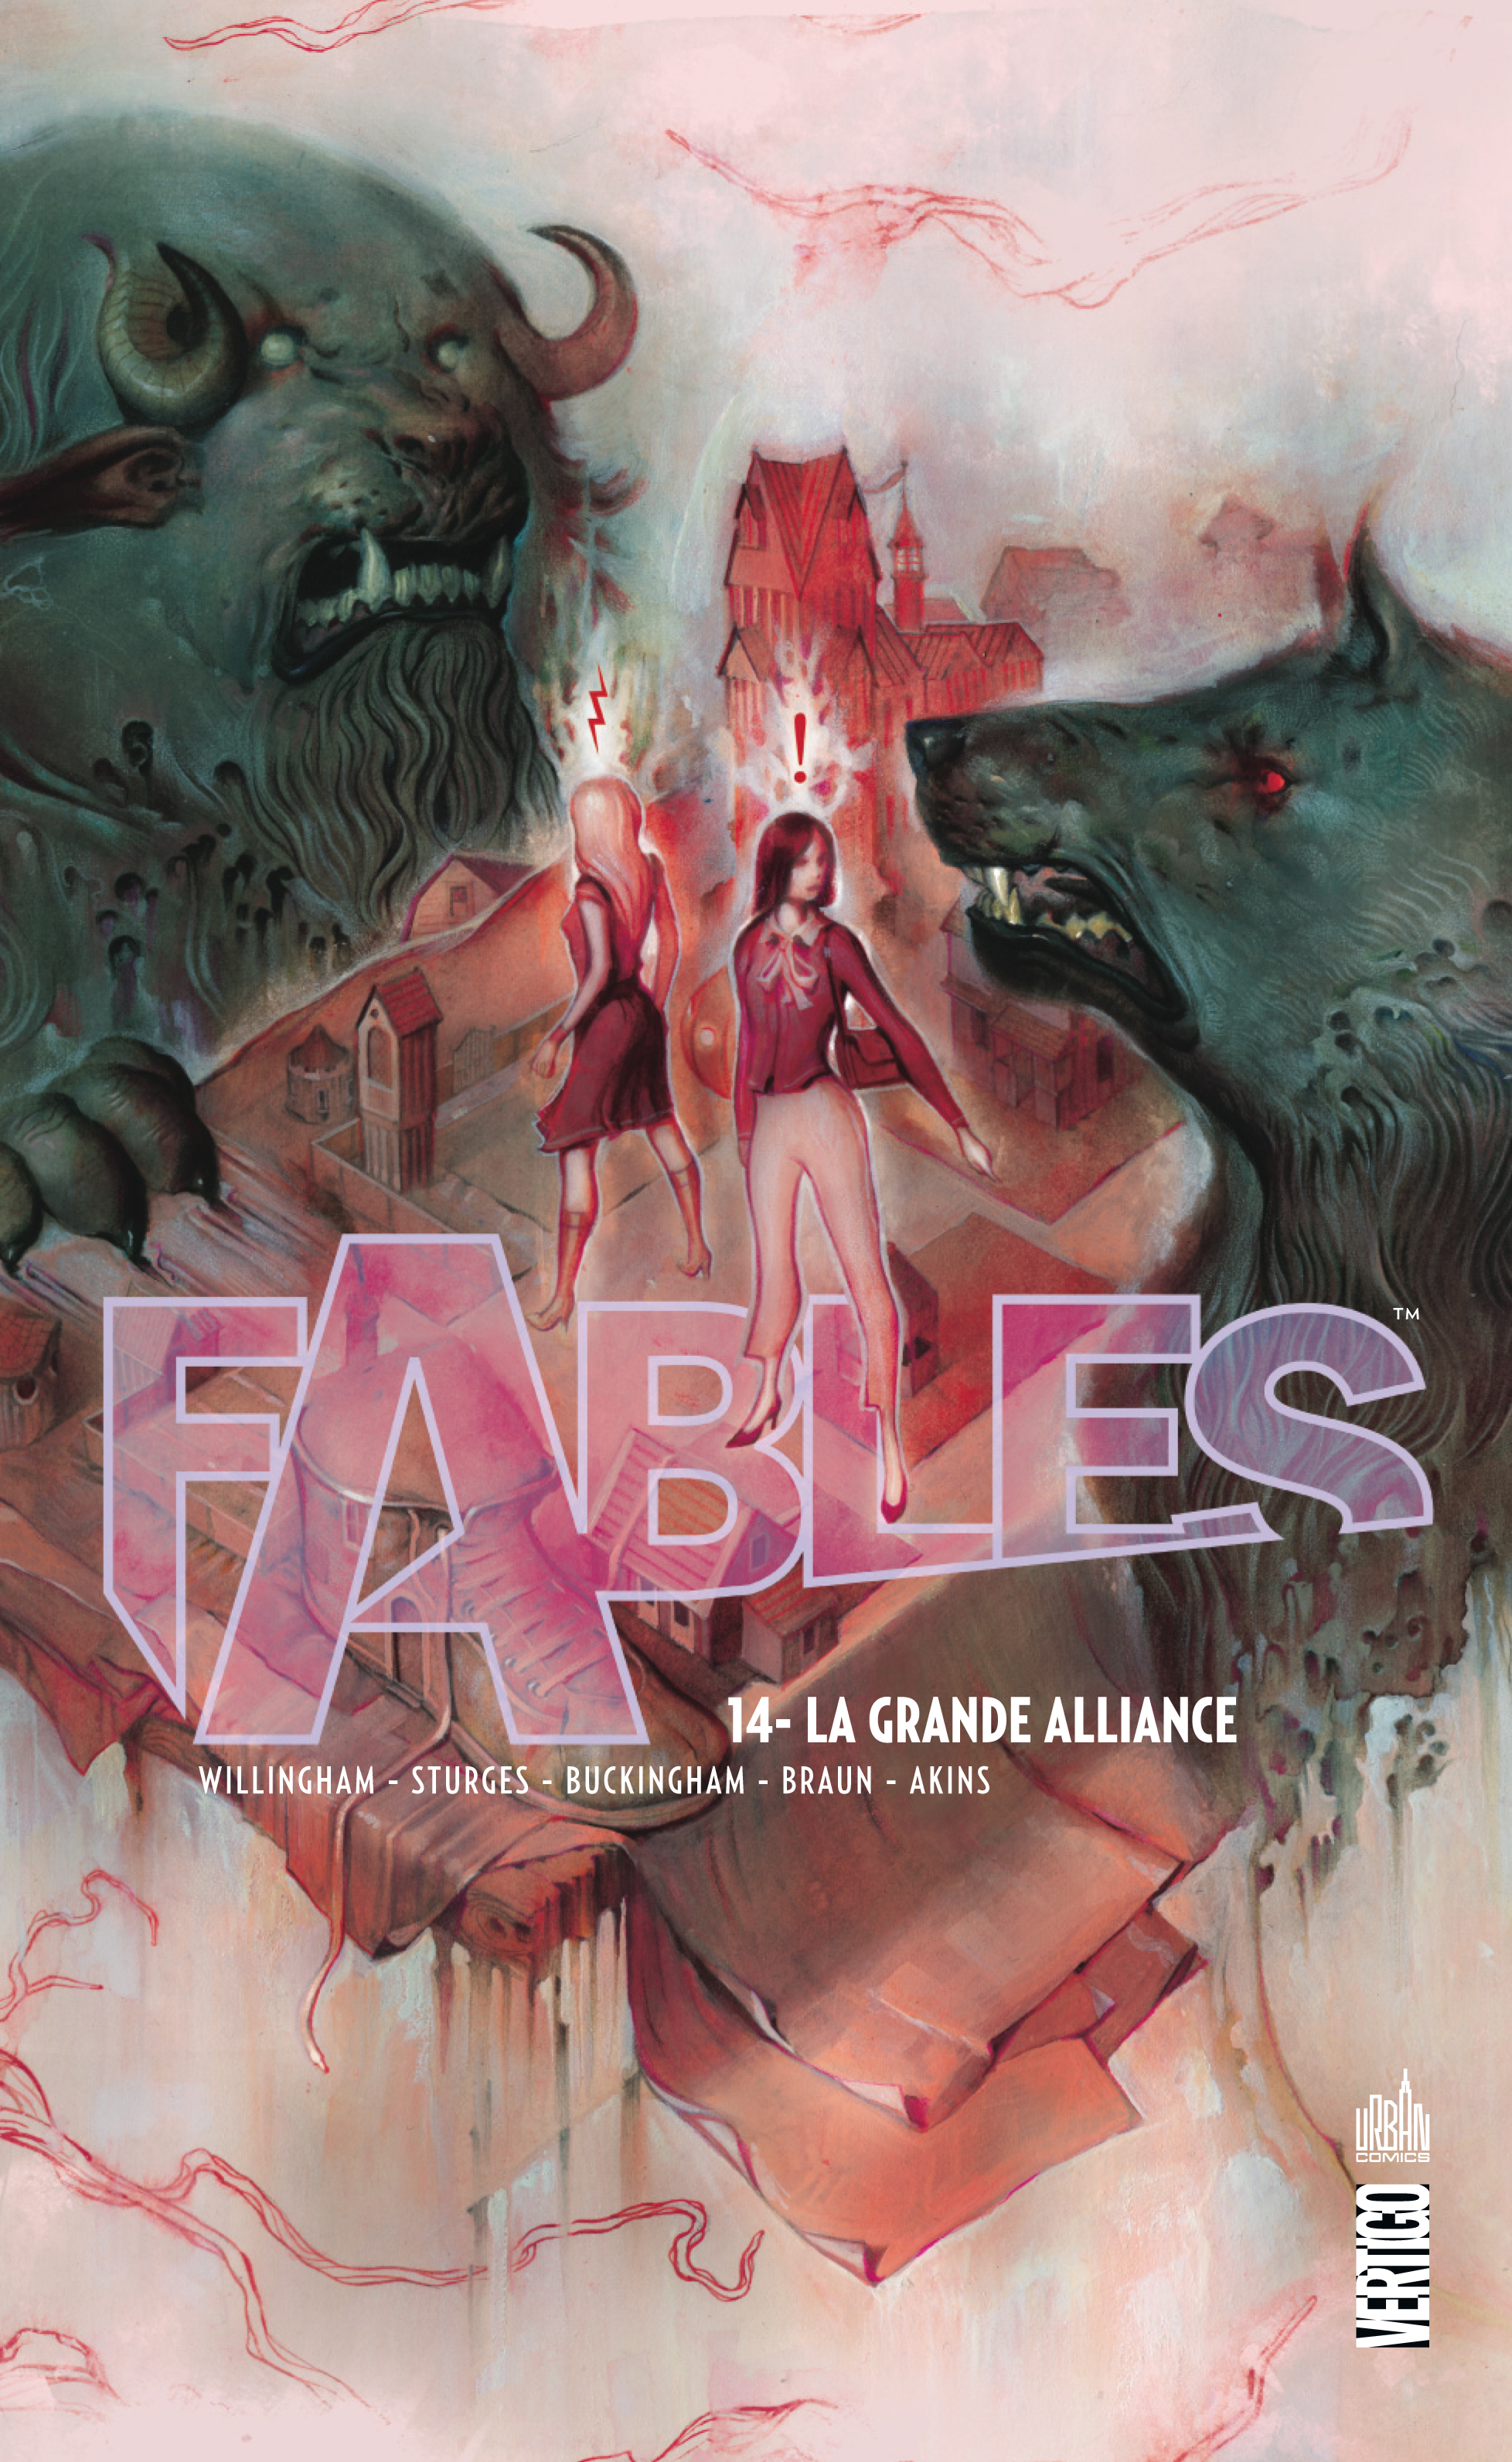 Fables – Hardcover, T14 : La grande alliance (0), comics chez Urban Comics de Willingham, Sturges, Buckingham, Akins, Braun, Vozzo, Loughridge, Ruas